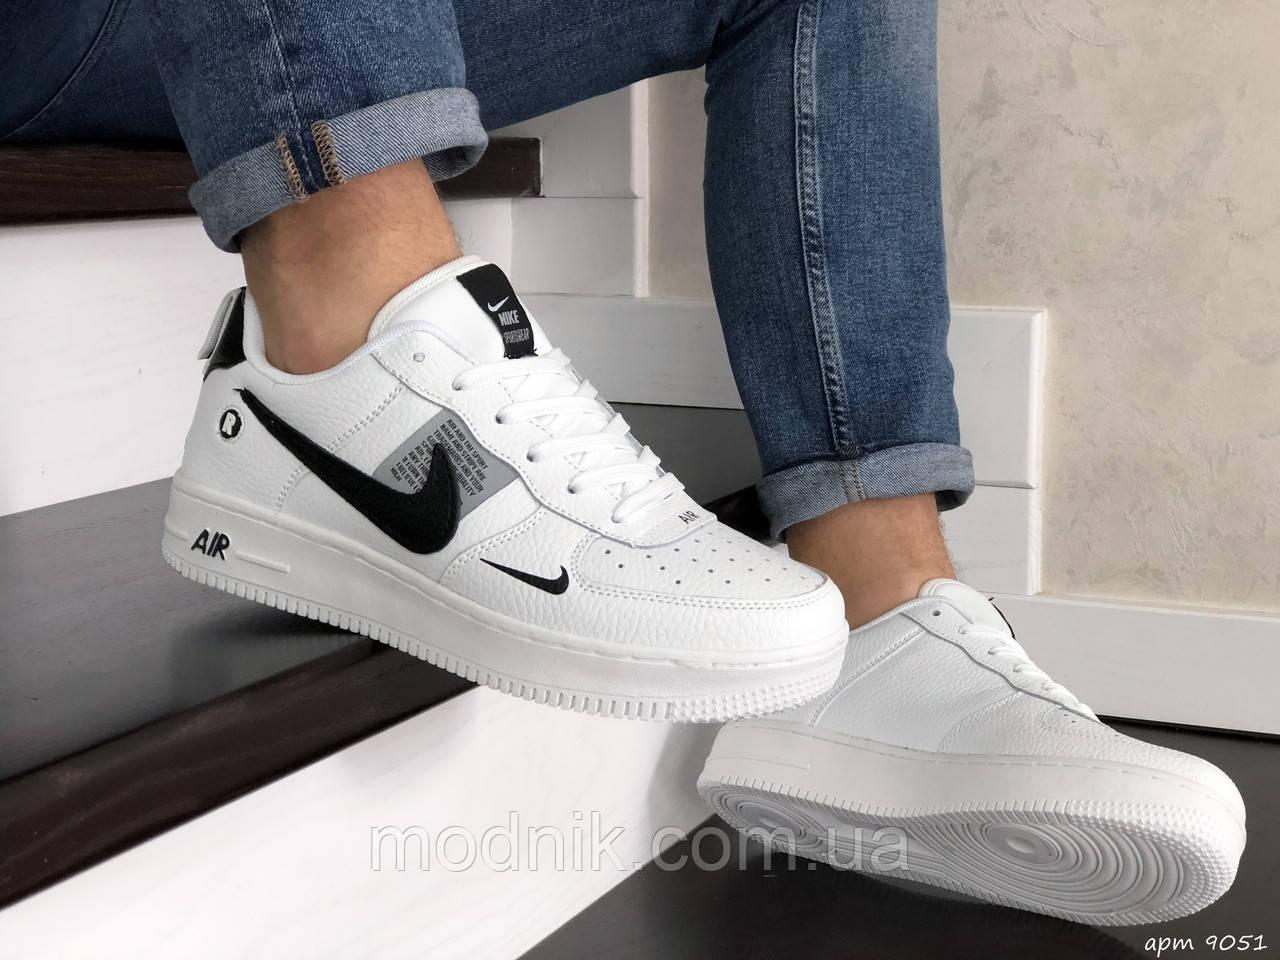 Мужские кроссовки Nike Air Force (белые) 9051